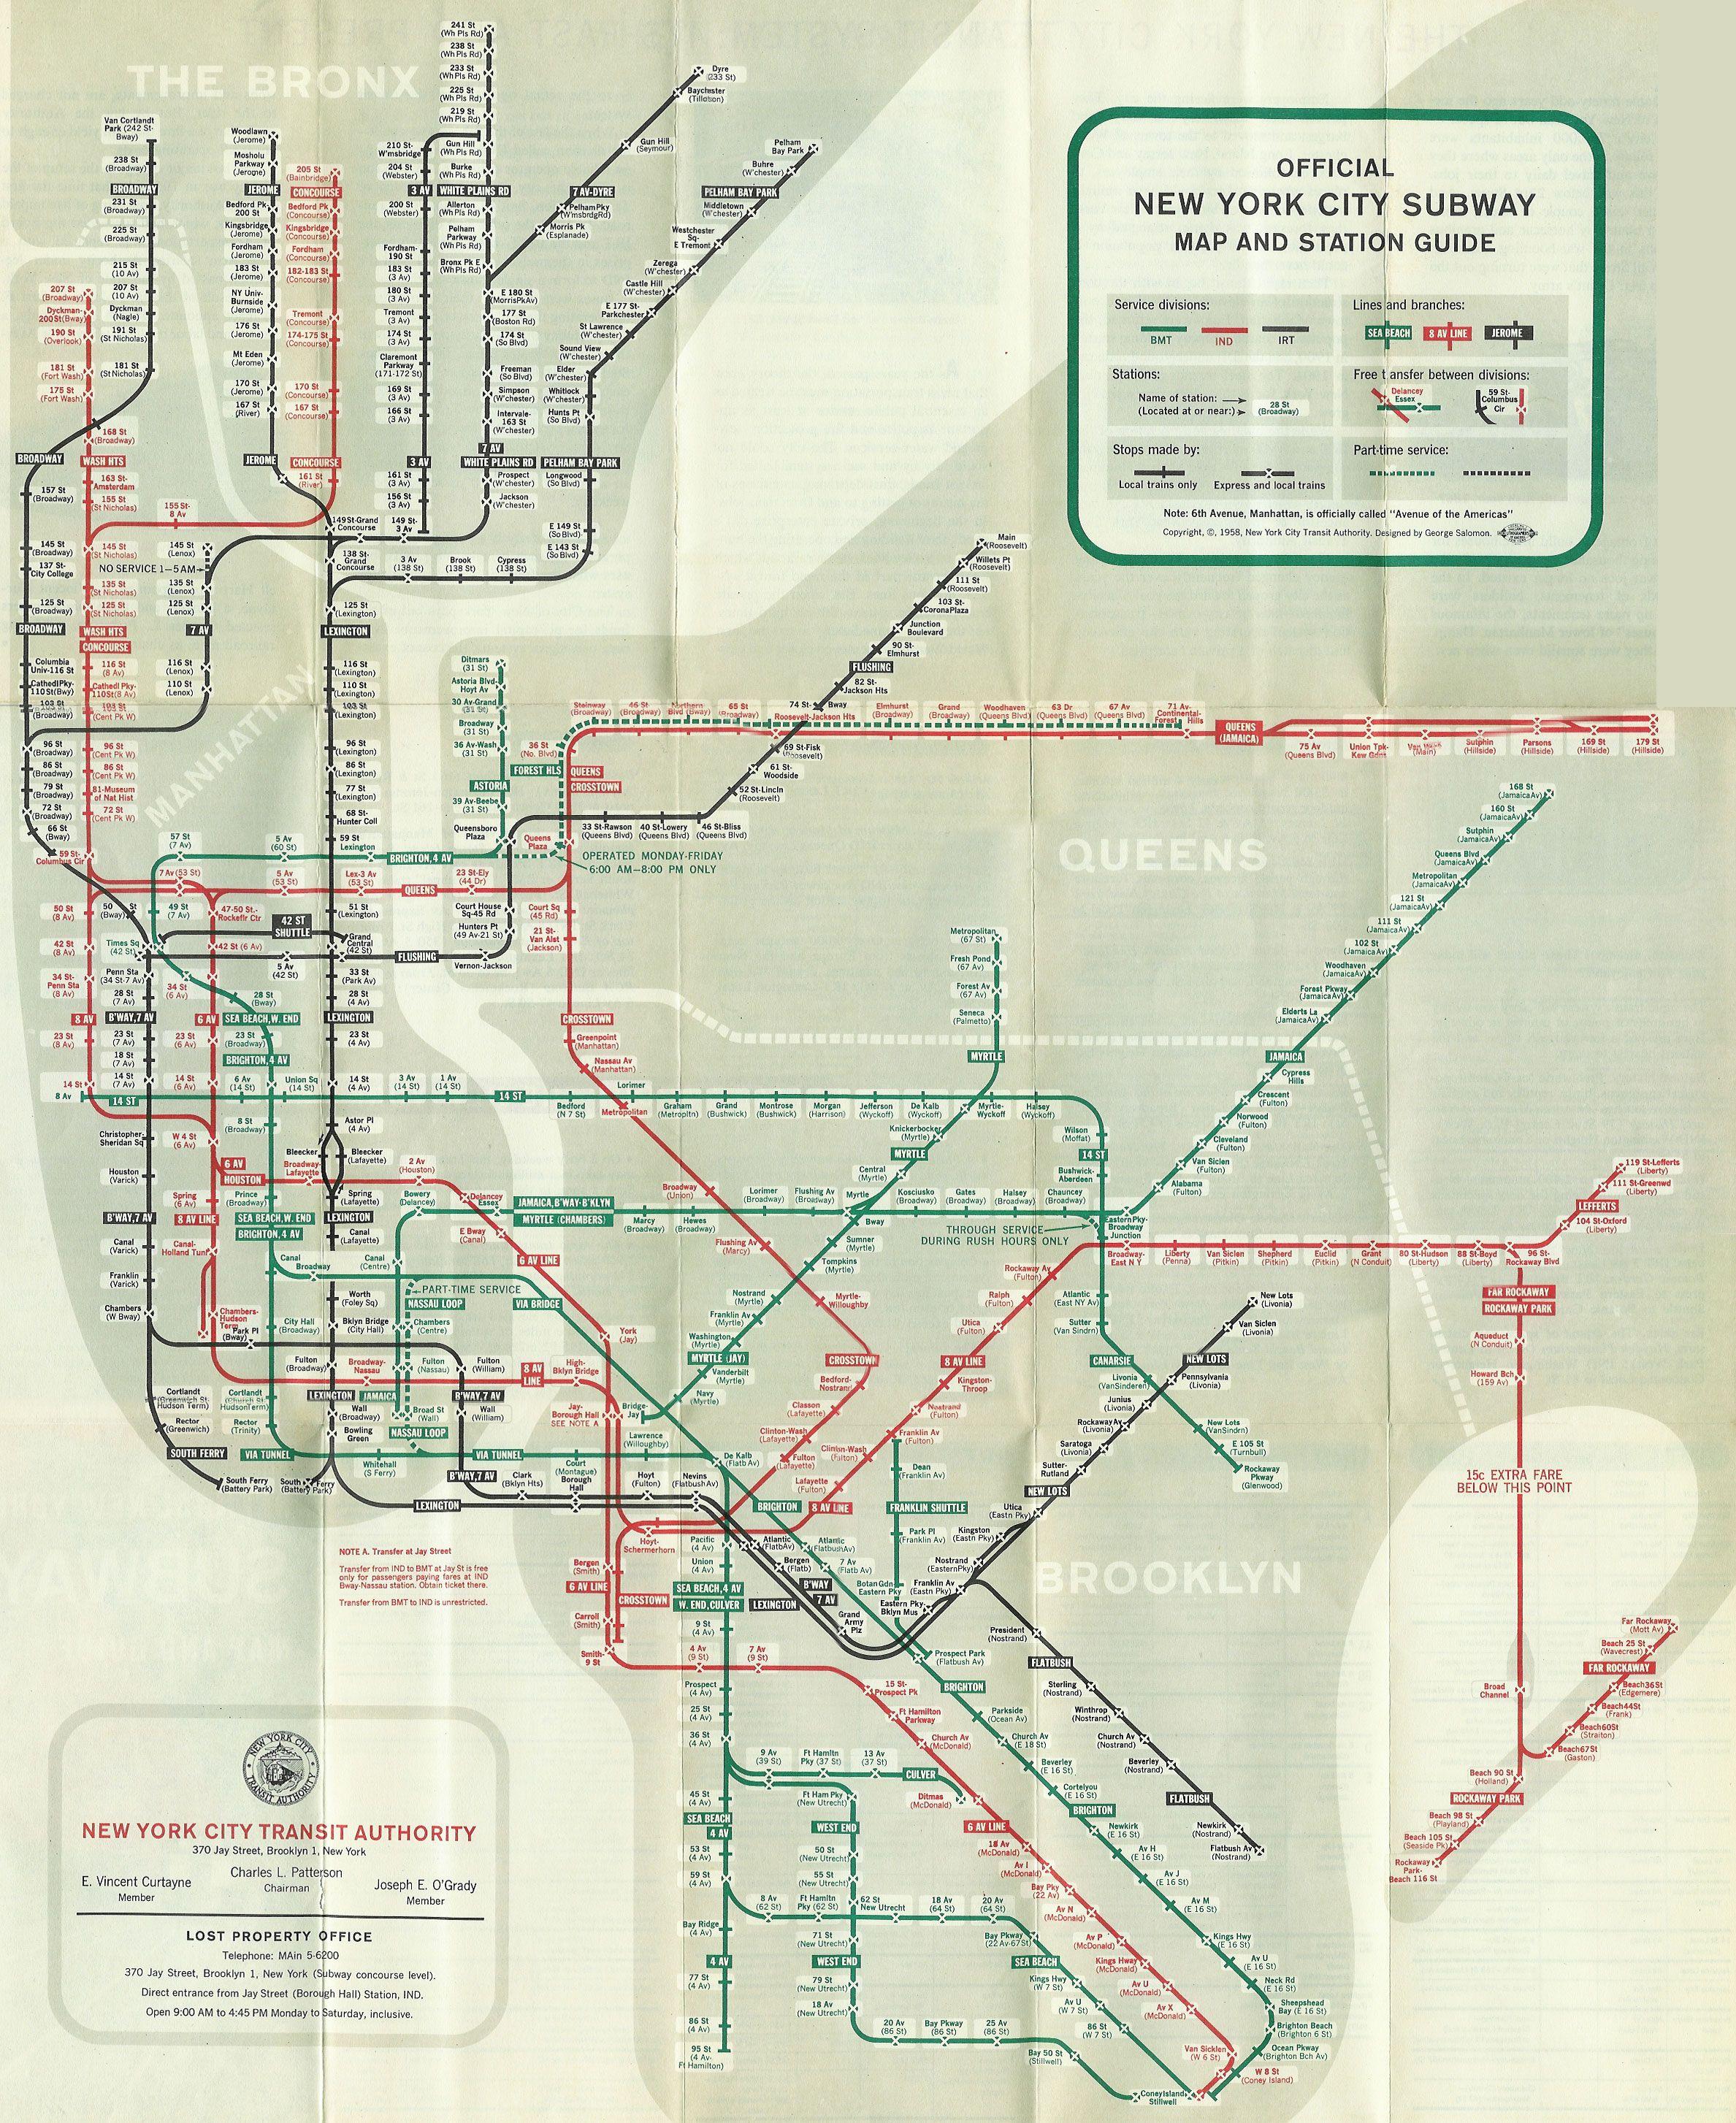 Nyc Subway Map Google.1970s Nyc Subway Map Google Search Lndscp Reg Representation